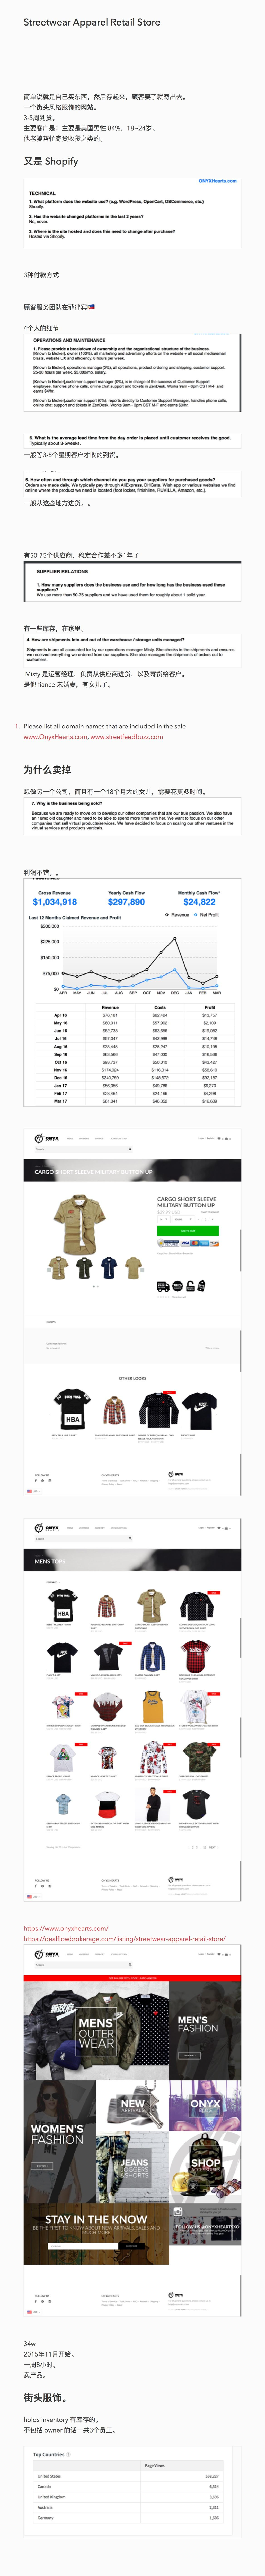 Streetwear-Apparel-Retail-Store-1